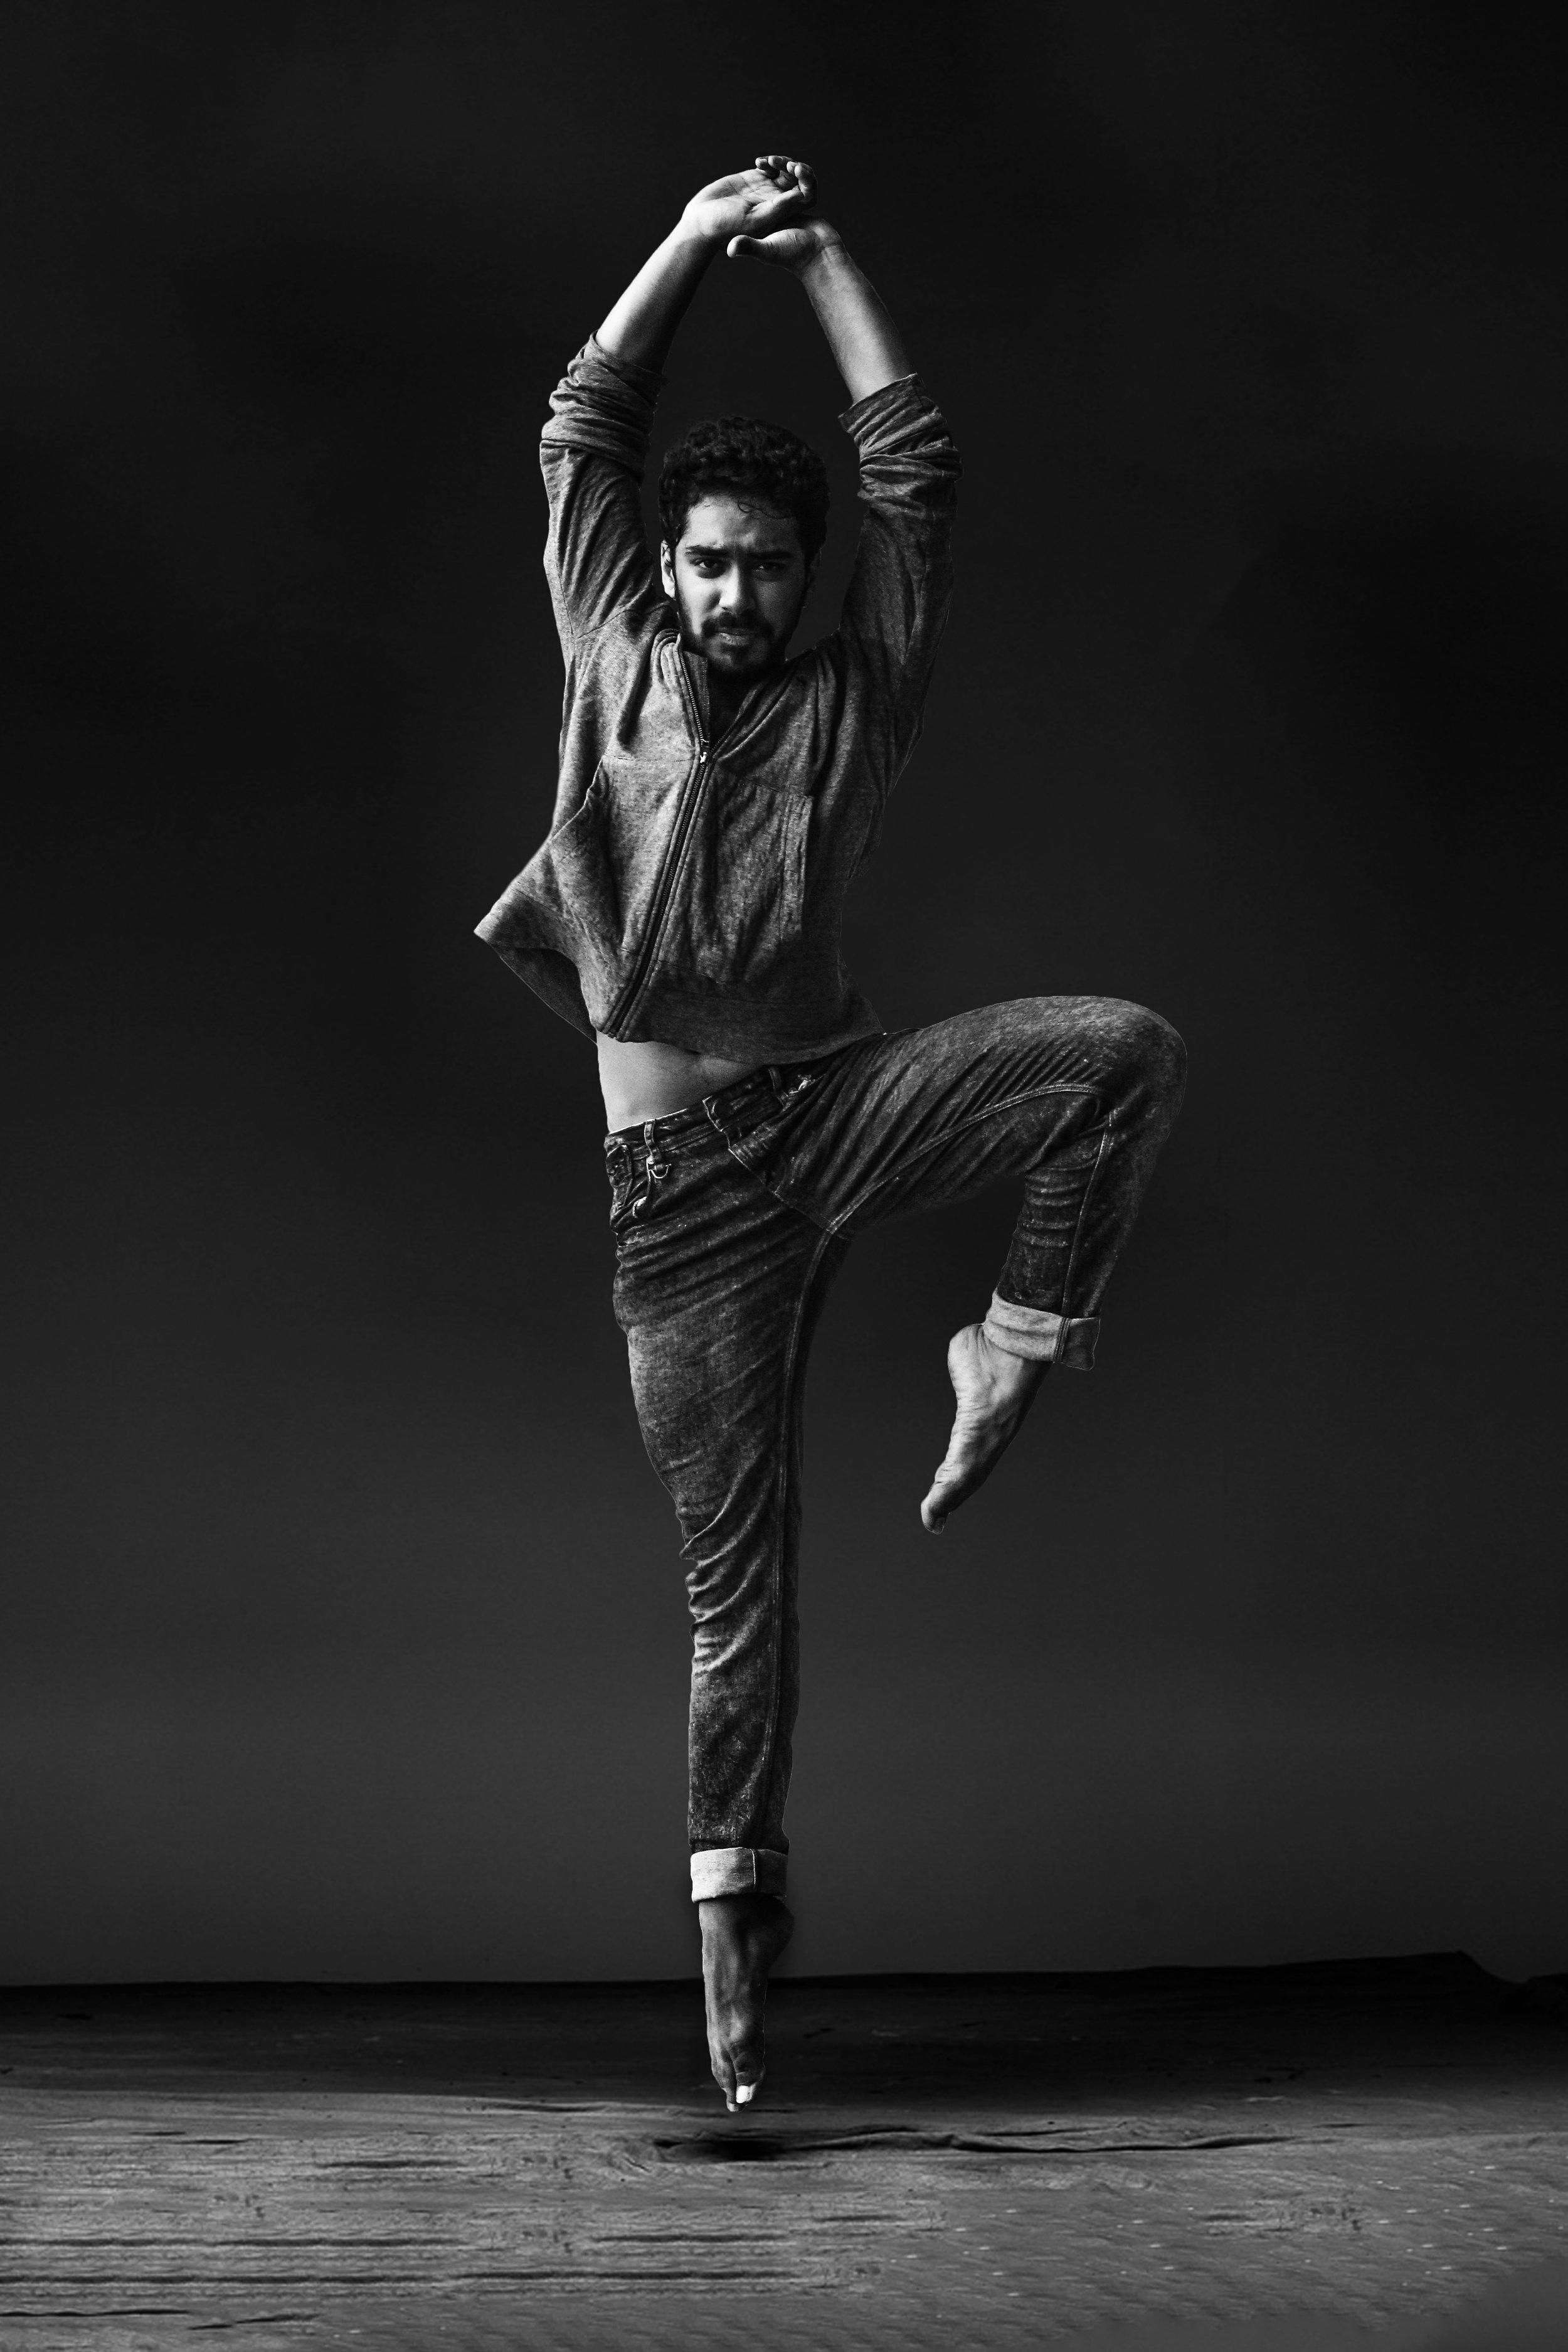 balance-ballet-dancer-ballet-dancers-1701209.jpg